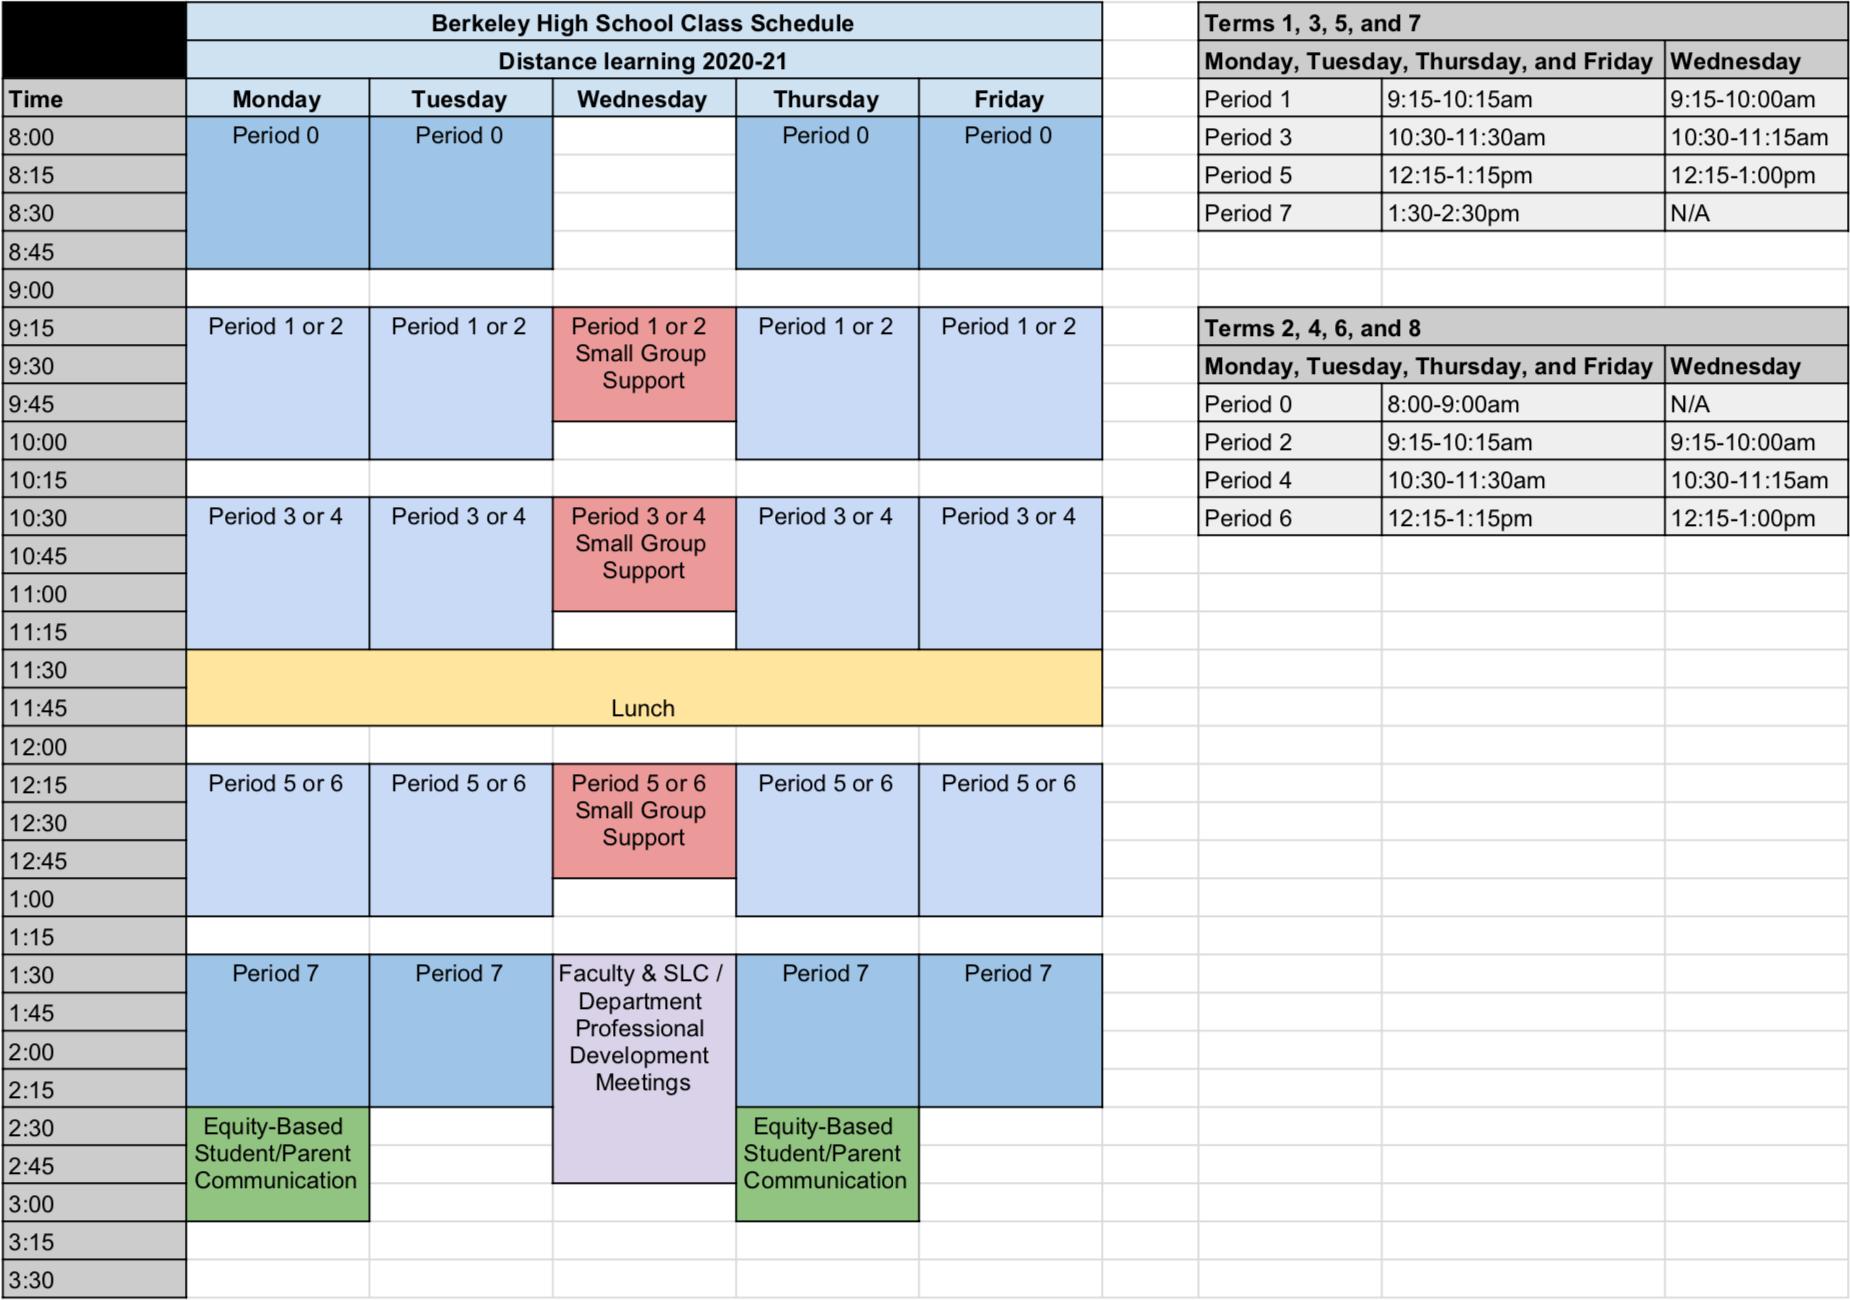 Berkeley High School for Berkeley Academic Calendar